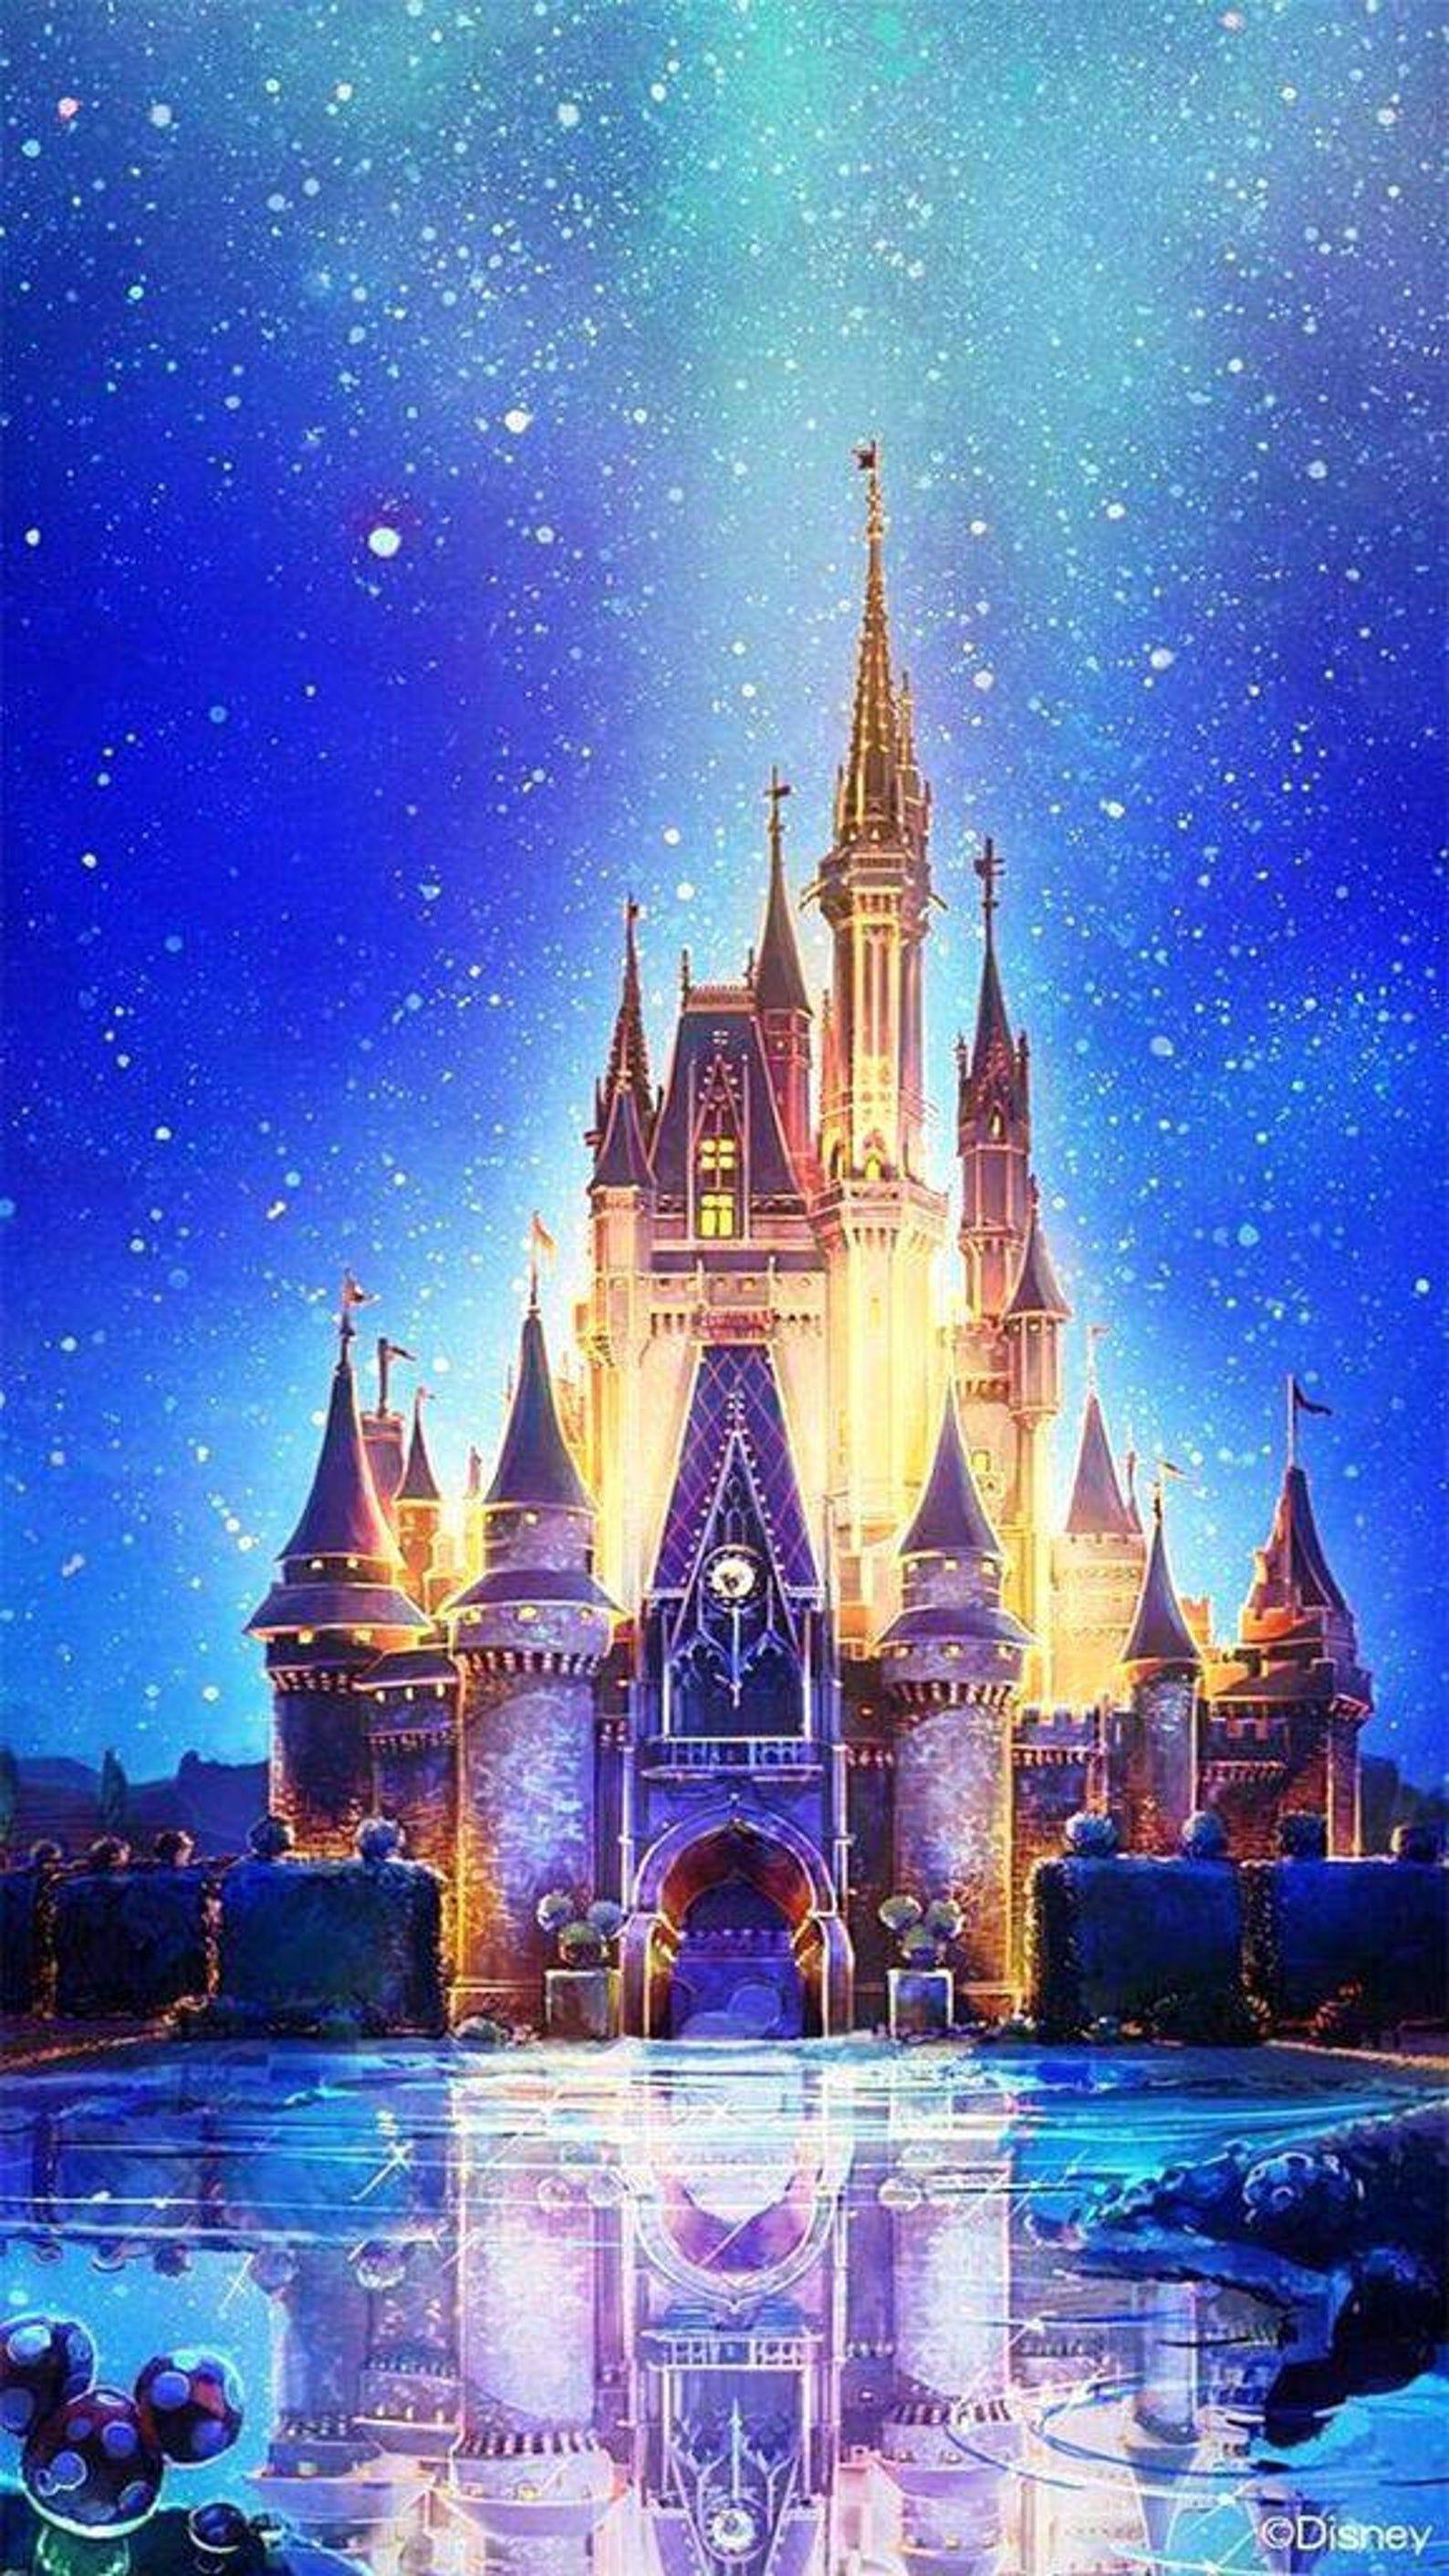 Buy 2 Get 1 Free Disney Castle Magic 754 Modern Cross Stitch Etsy In 2020 Disney Wallpaper Disney Background Disney Princess Wallpaper